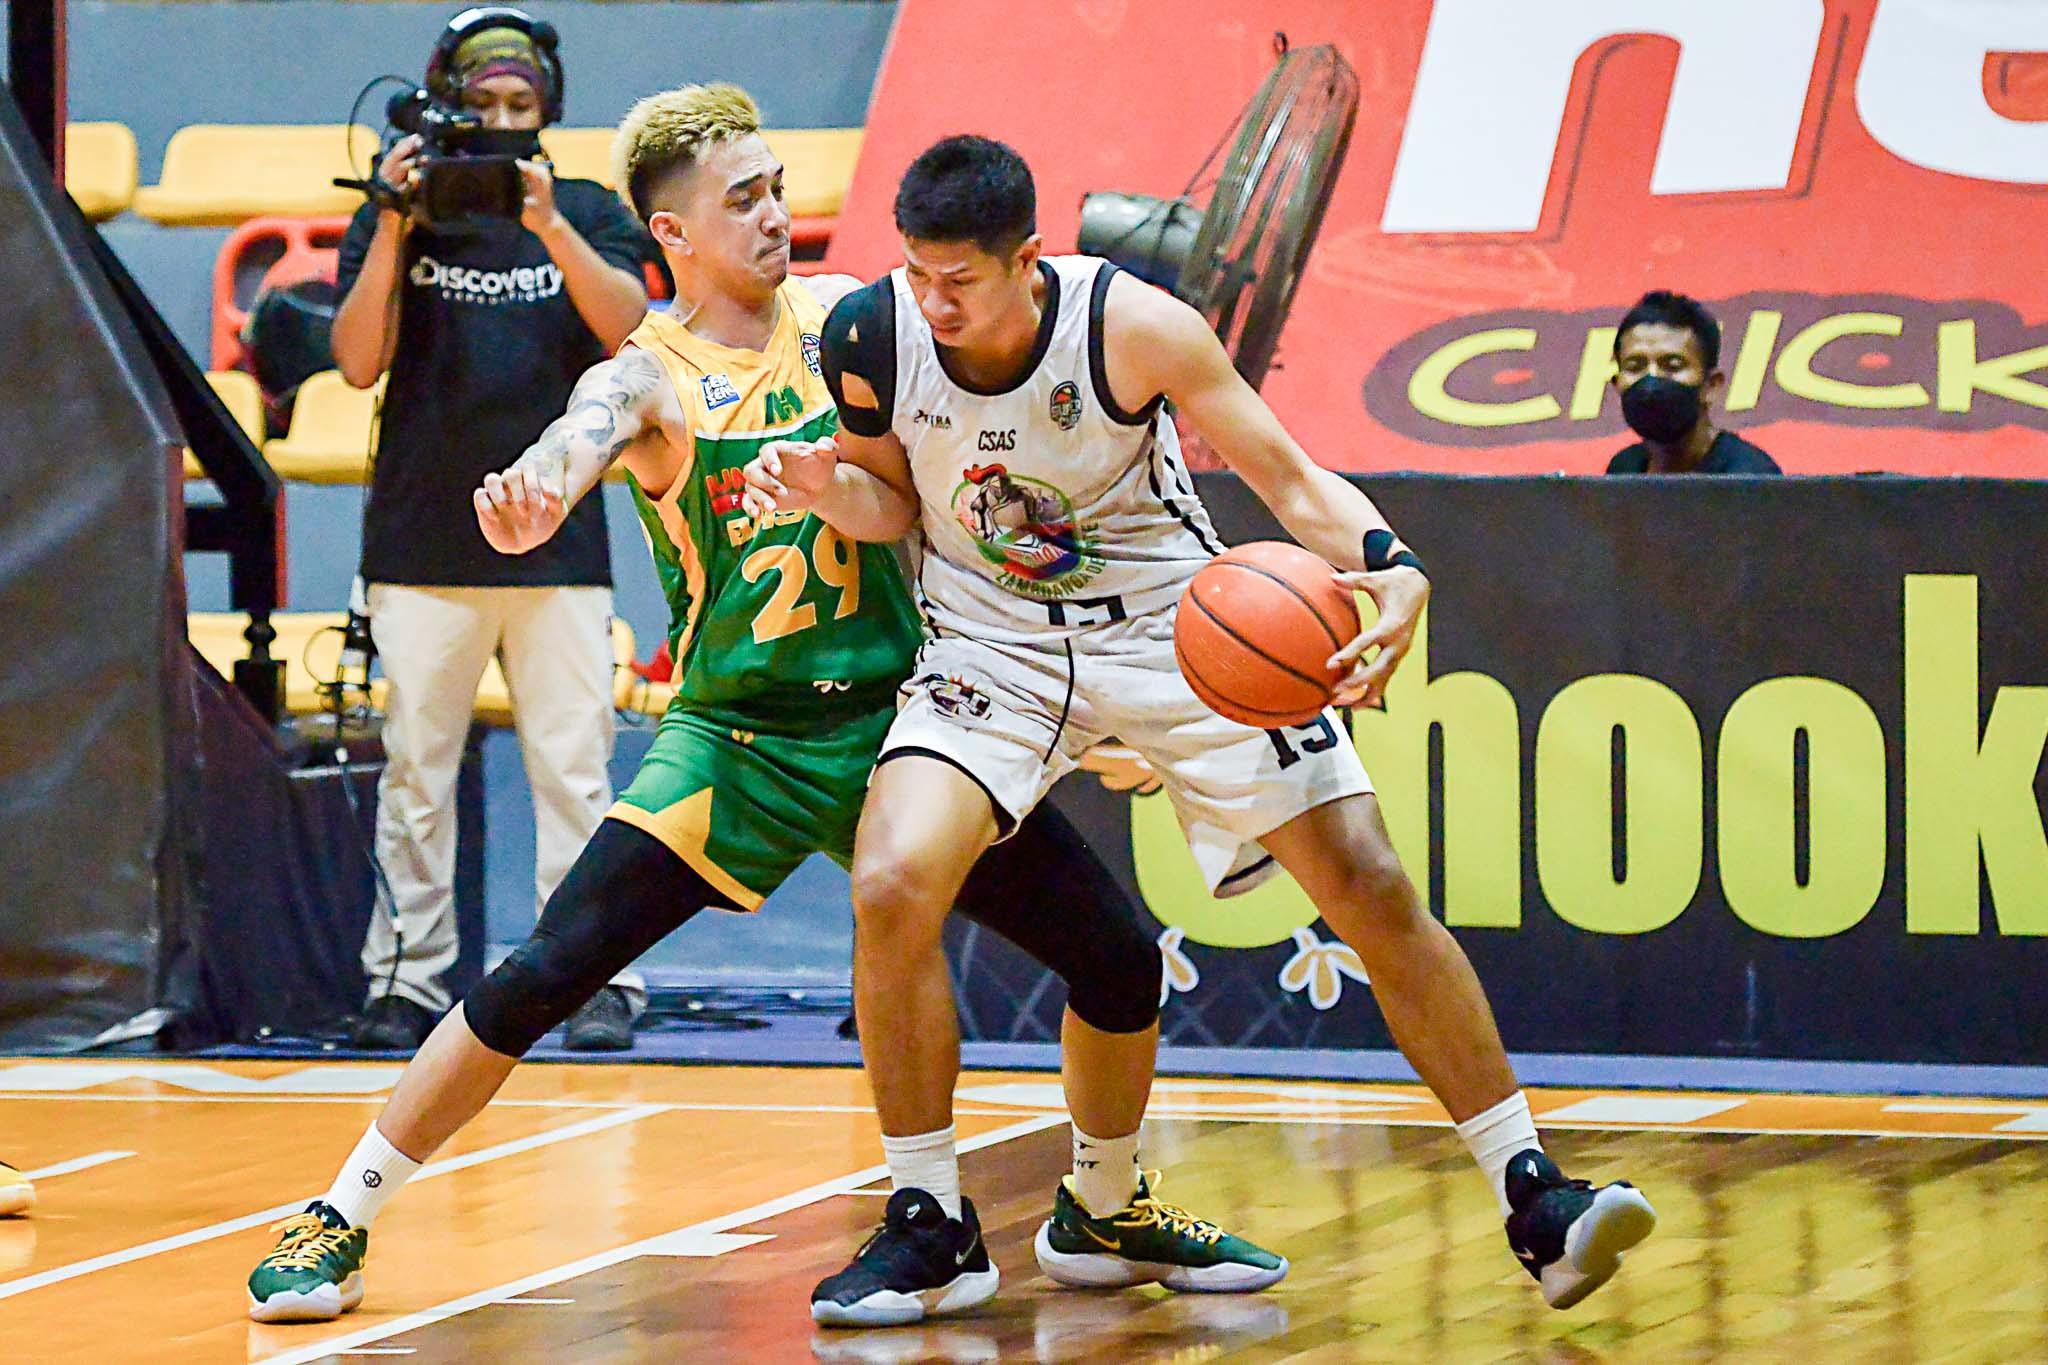 2021-Chooks-VisMin-Mindanao-Finals-Roxas-vs-Basilan-Jhong-Bondoc Roxas keeps head up after unexpected second place finish in VisMin Basketball News VisMin Super Cup  - philippine sports news